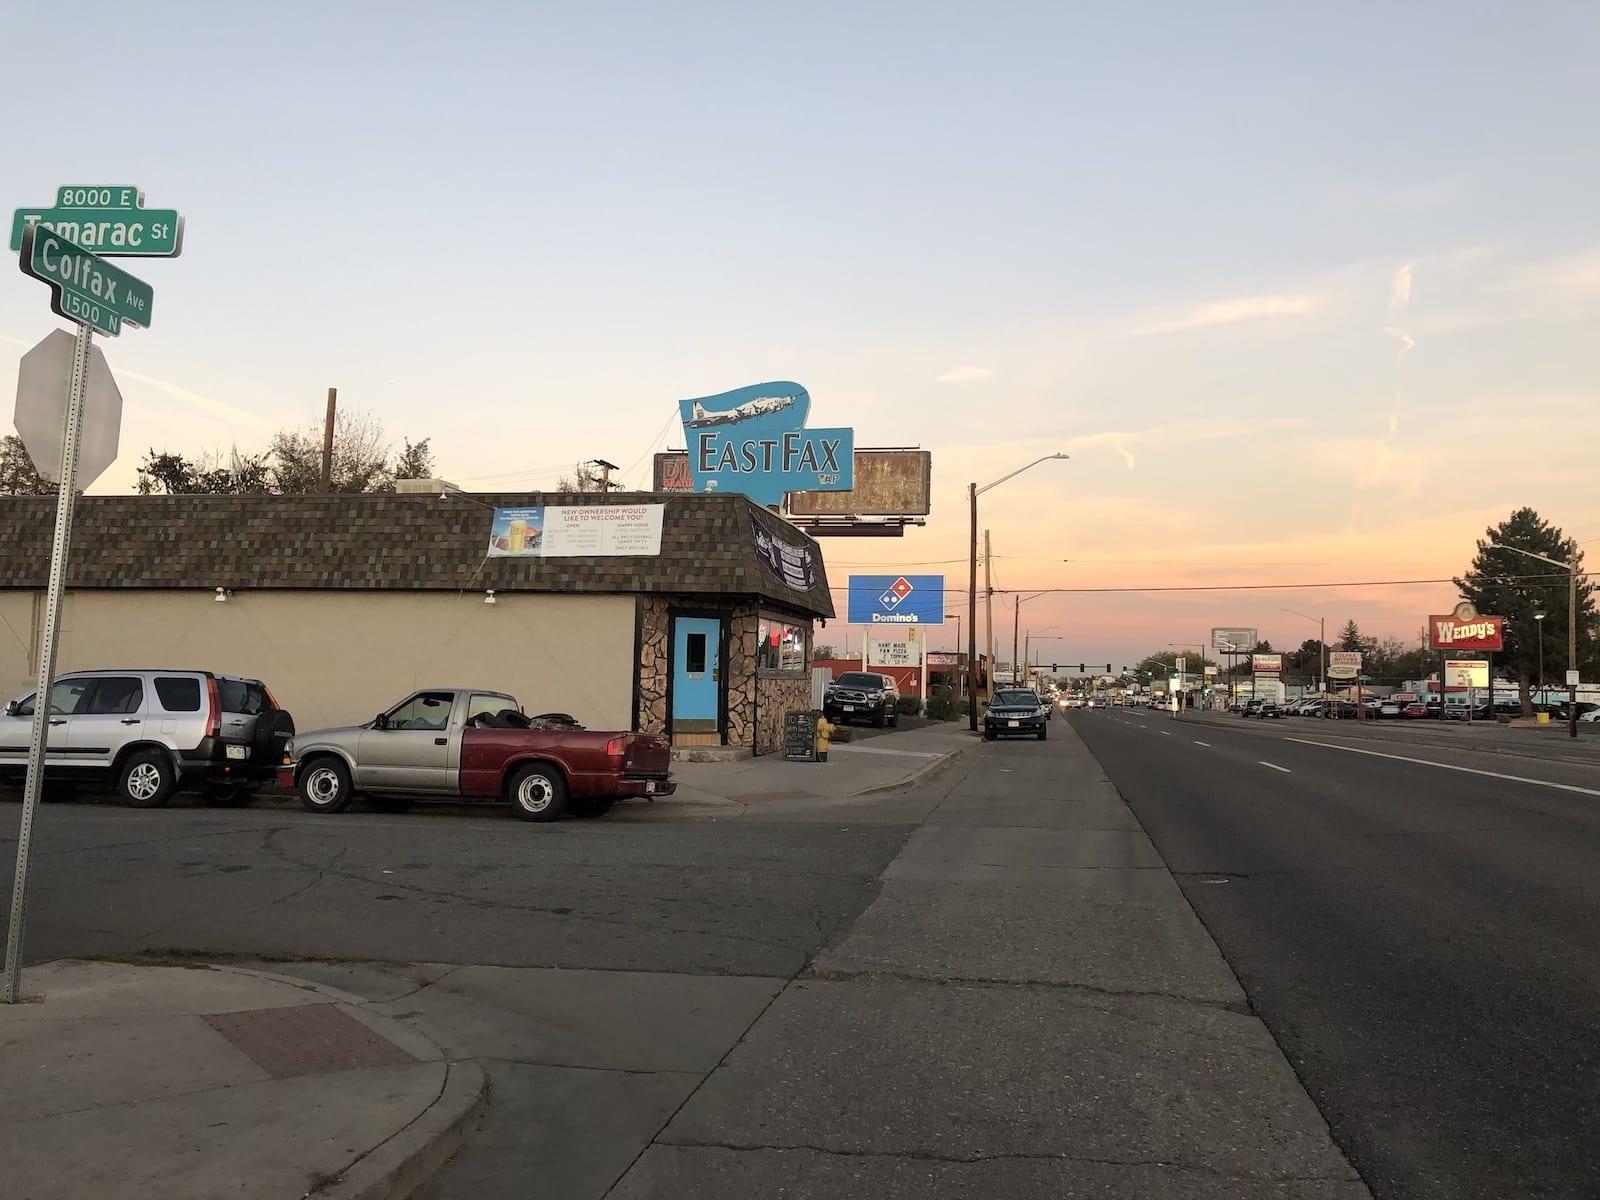 East Colfax Avenue and Tamarac Street Sign East Fax Bar